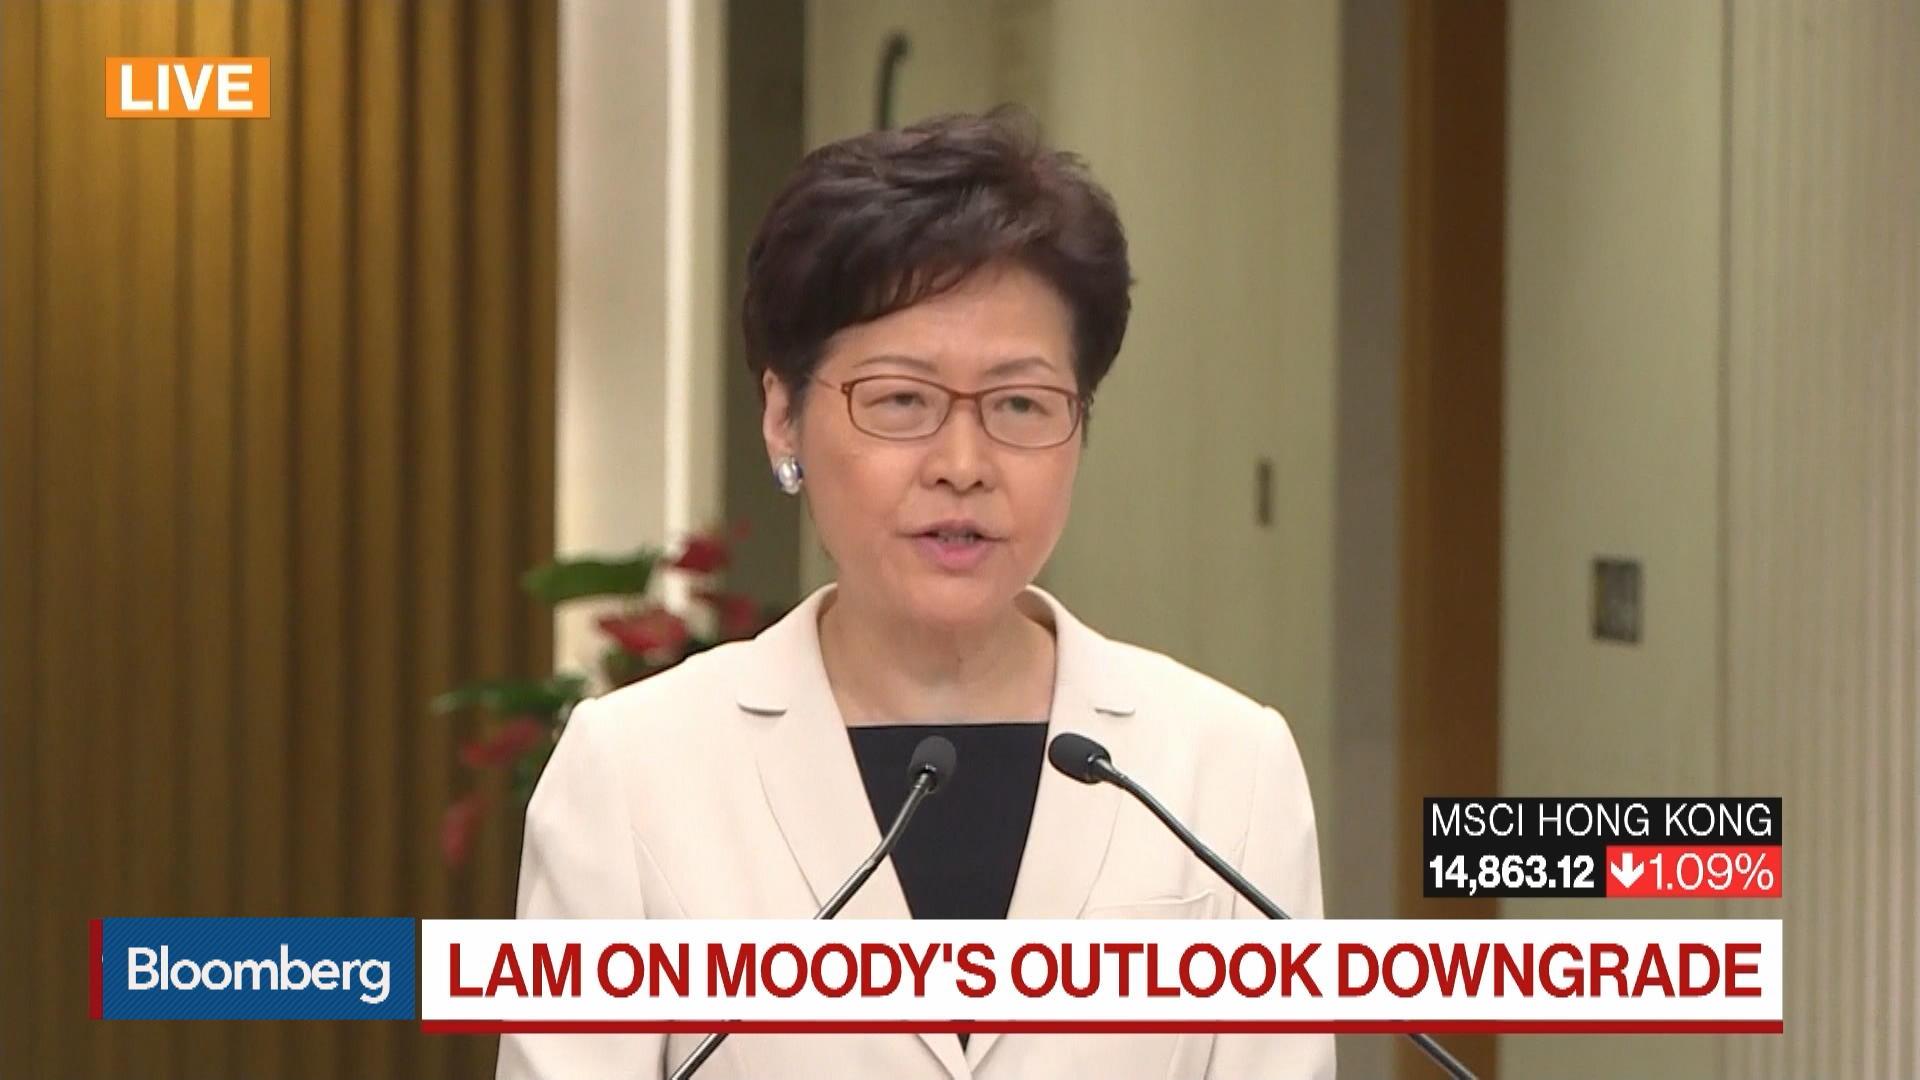 Hong Kong Executive Carrie Lam on Moody's Outlook Downgrade on Hong Kong